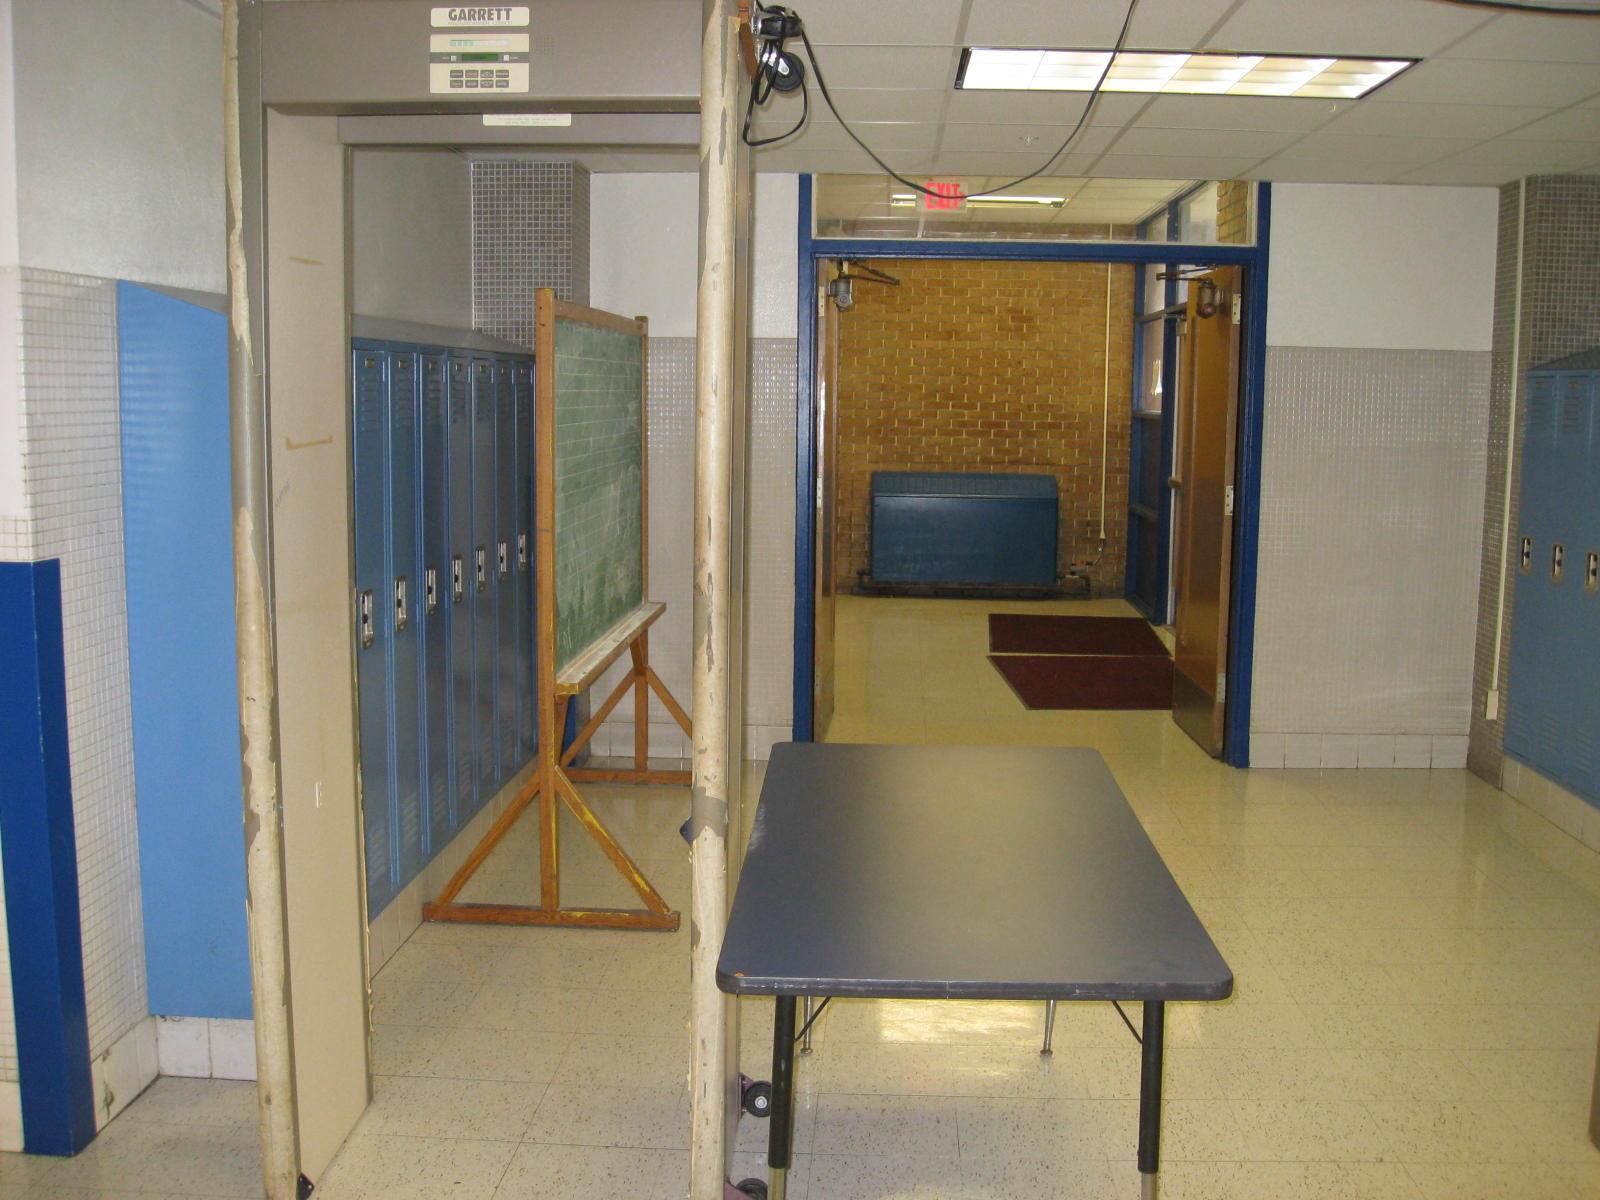 Security metal detector school - Metal Detector